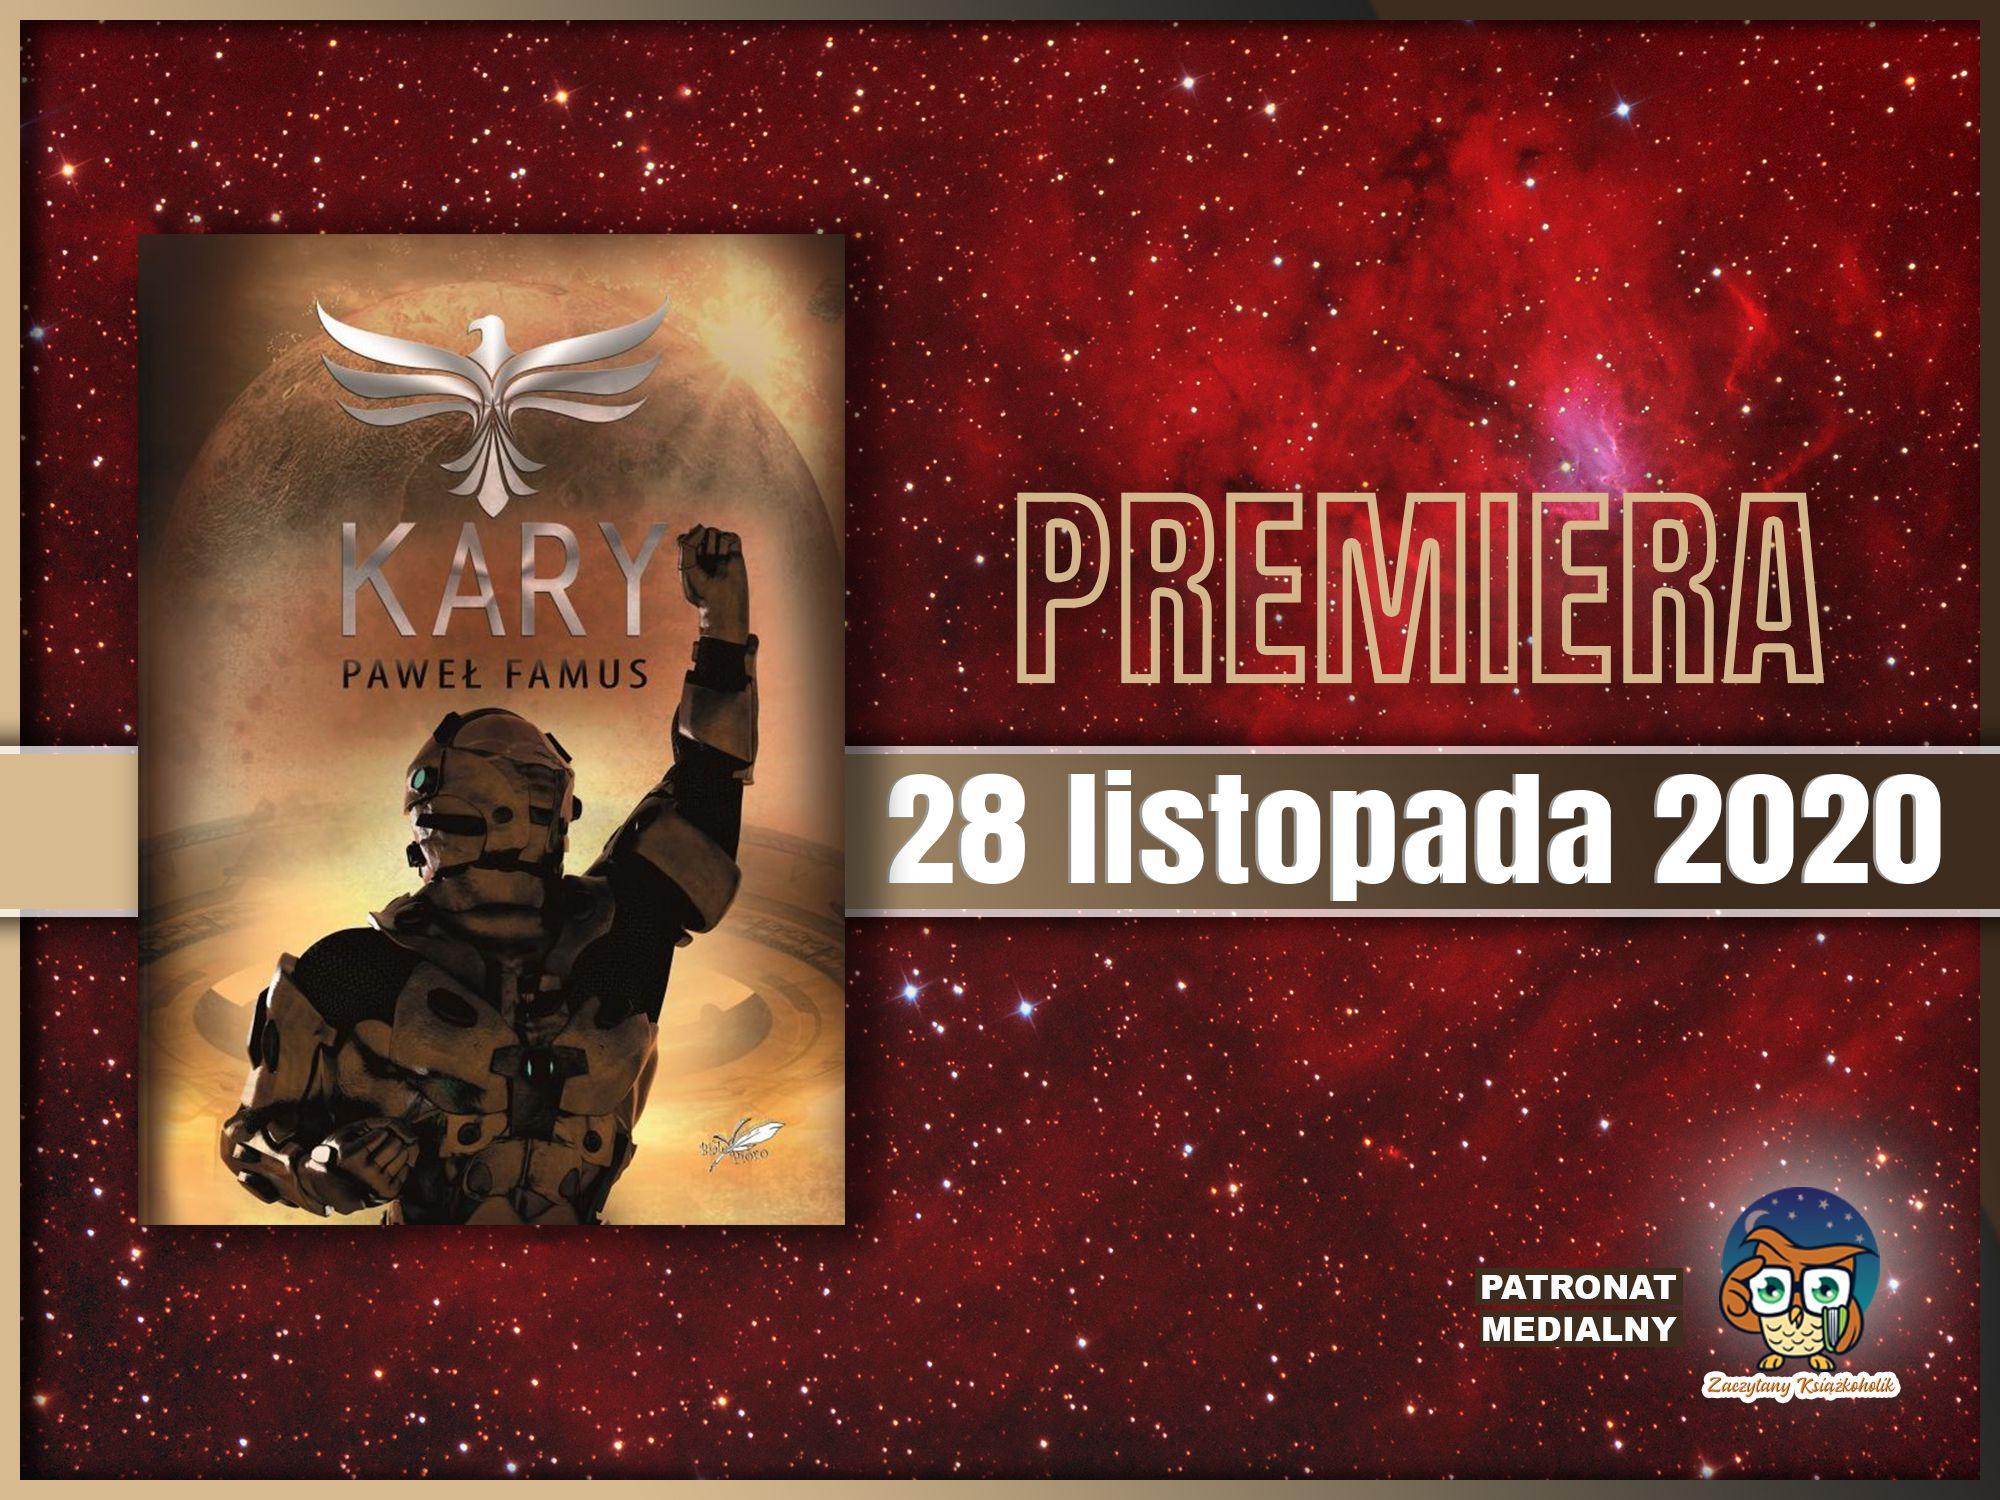 Kary, Paweł Famus, zaczytanyksiazkoholik.pl